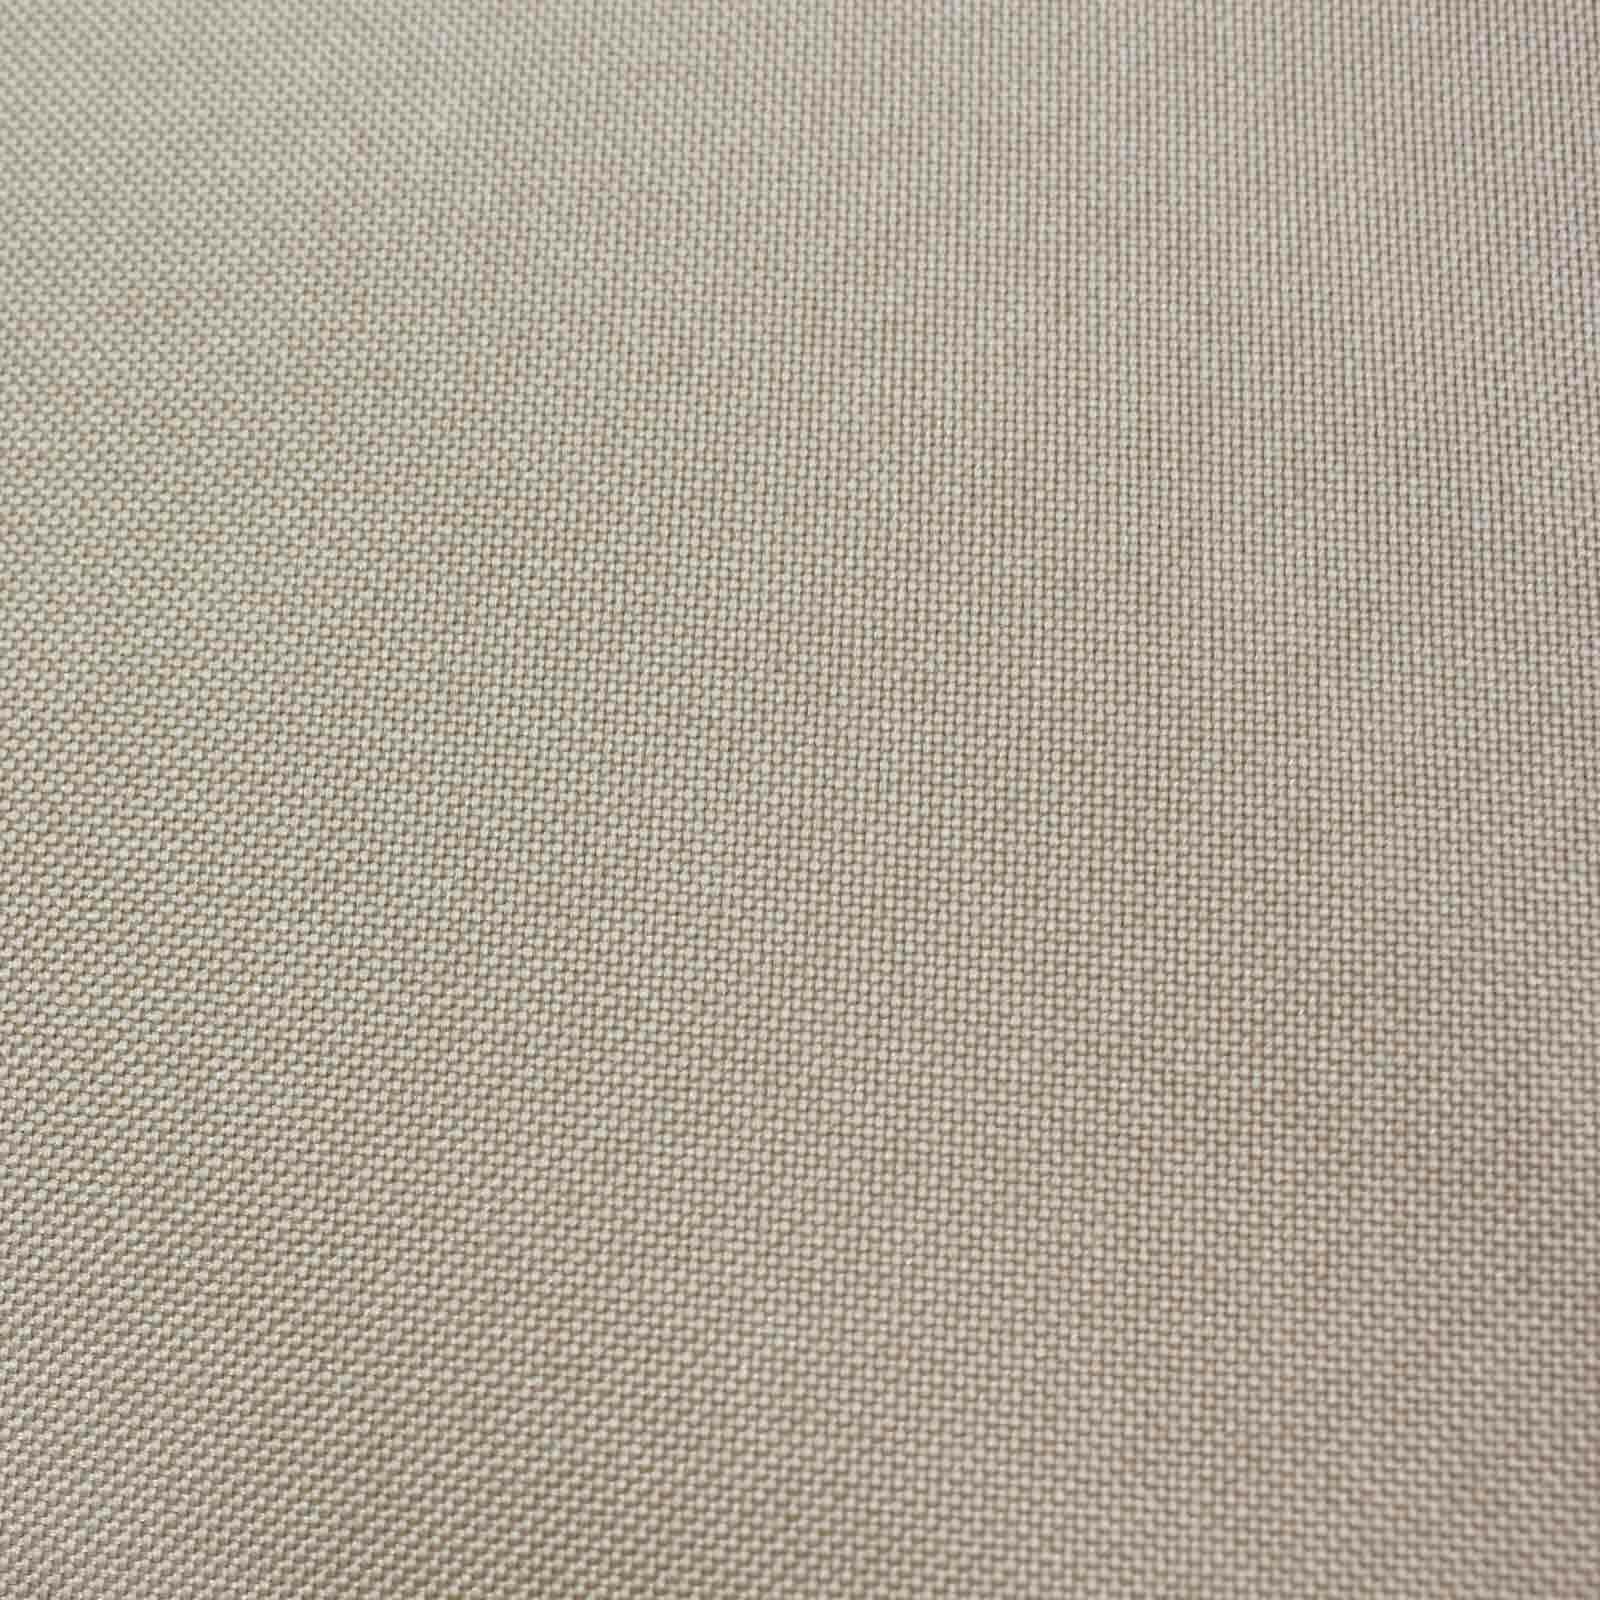 Tk Classics Capecod Water Resistant 3 Piece Patio Sofa Cover Set Wayfair